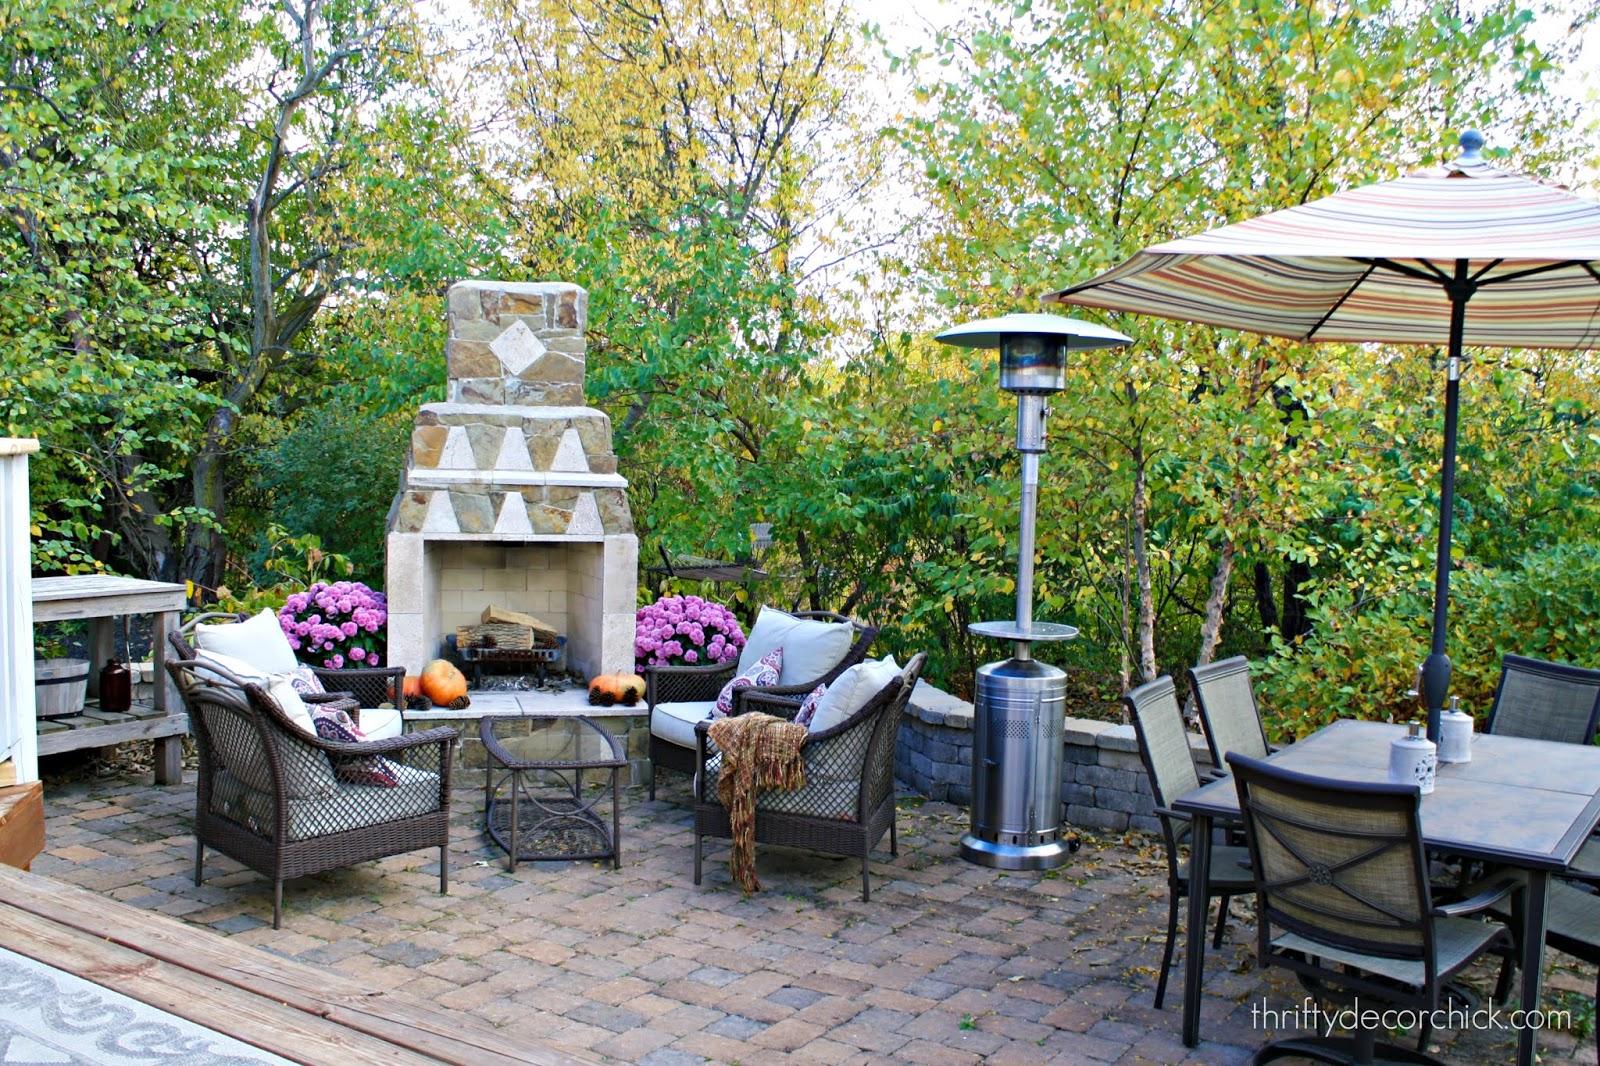 Paver patio with stone fireplace